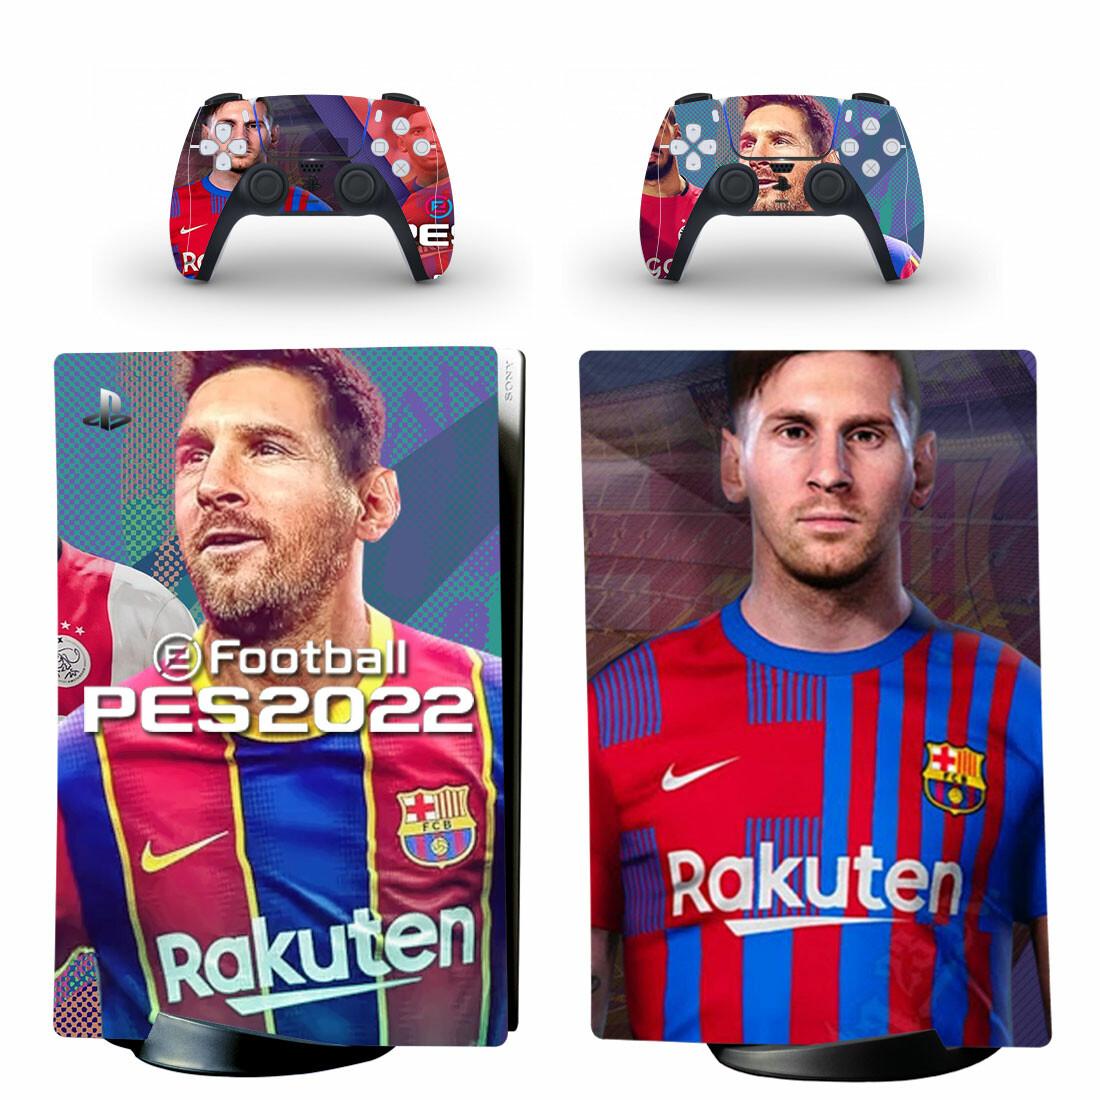 Football PES2022 PS5 Digital Edition Skin Sticker Decal